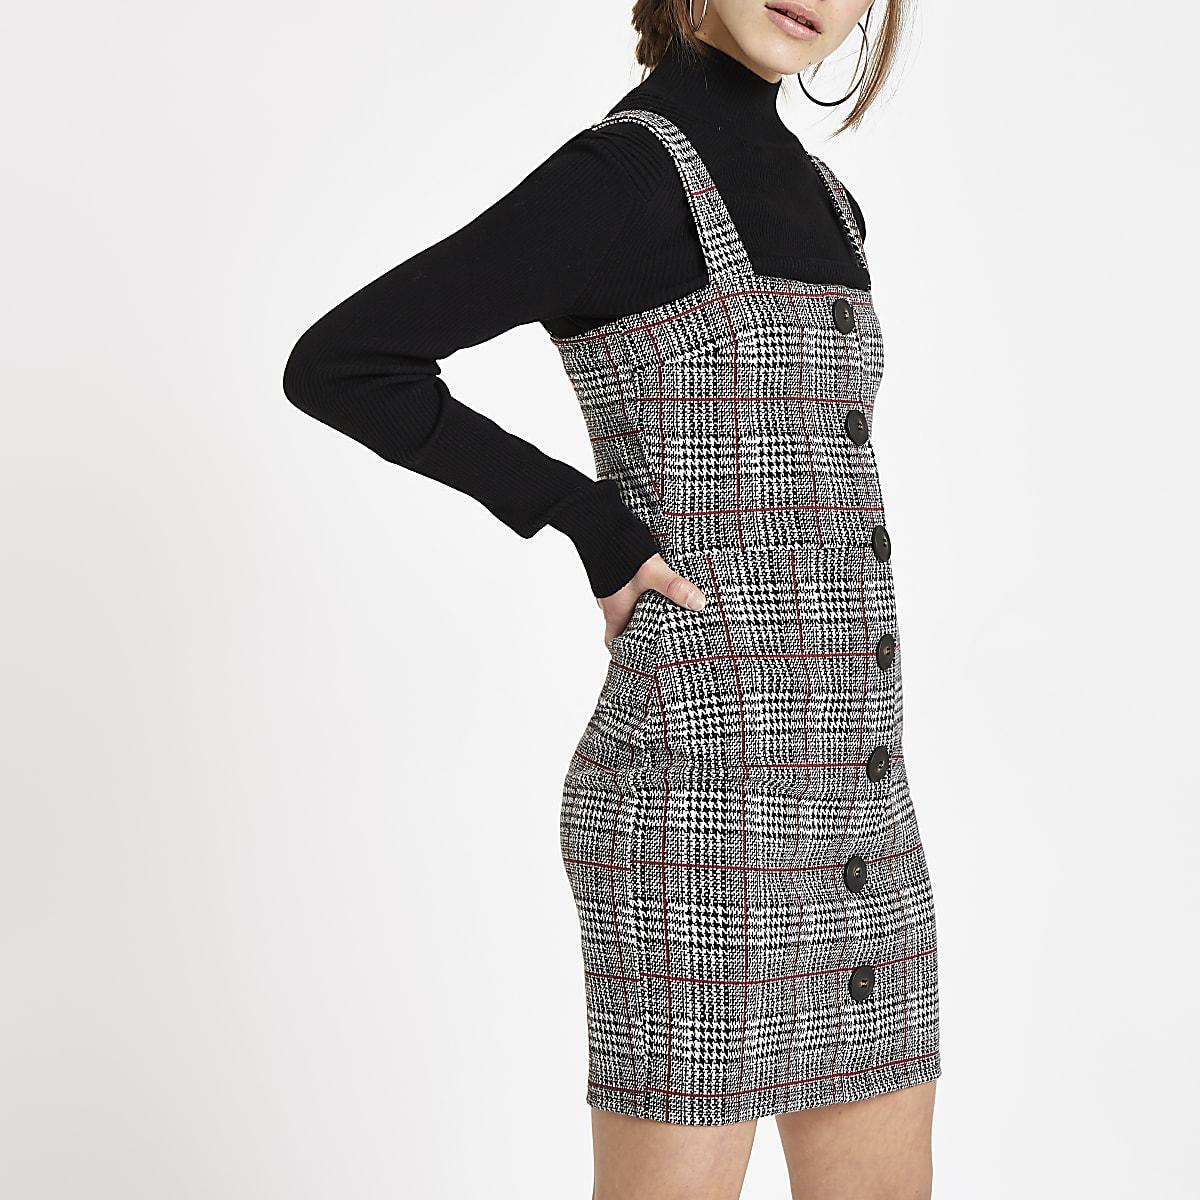 Petite grey check button up pinafore dress